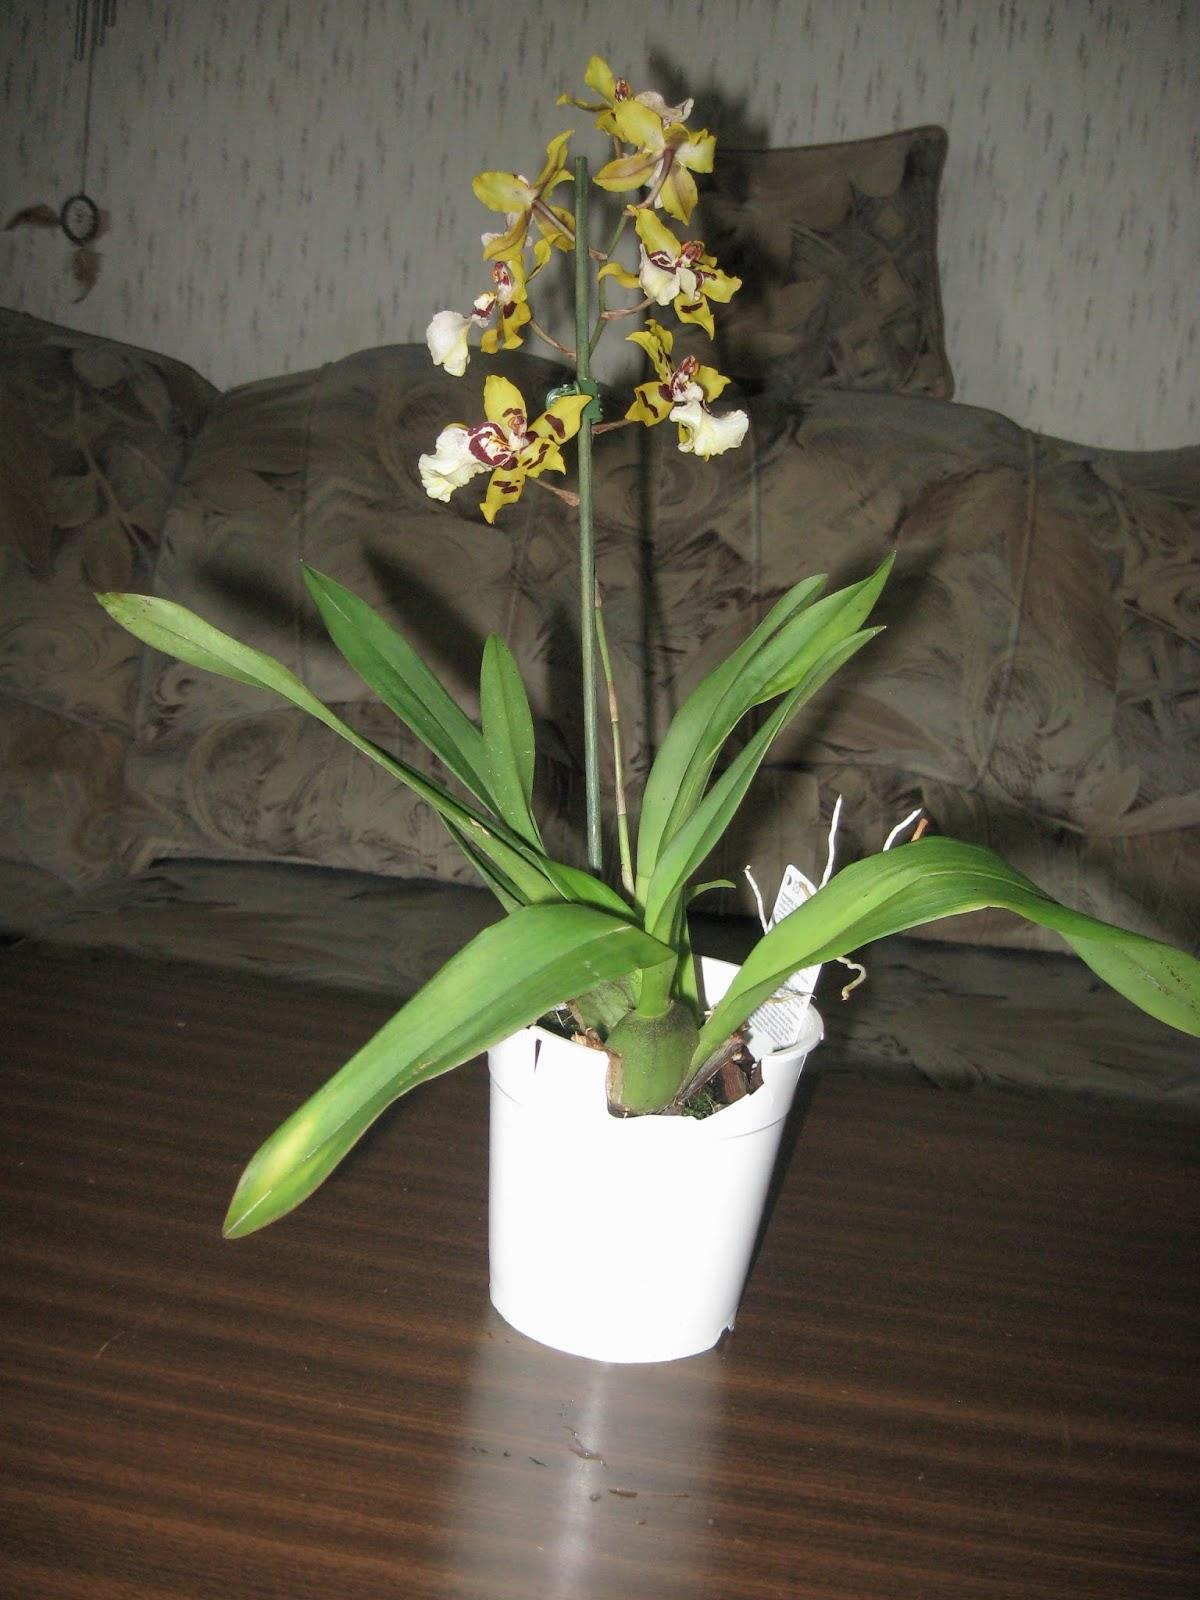 Cambria orchid- общий вид